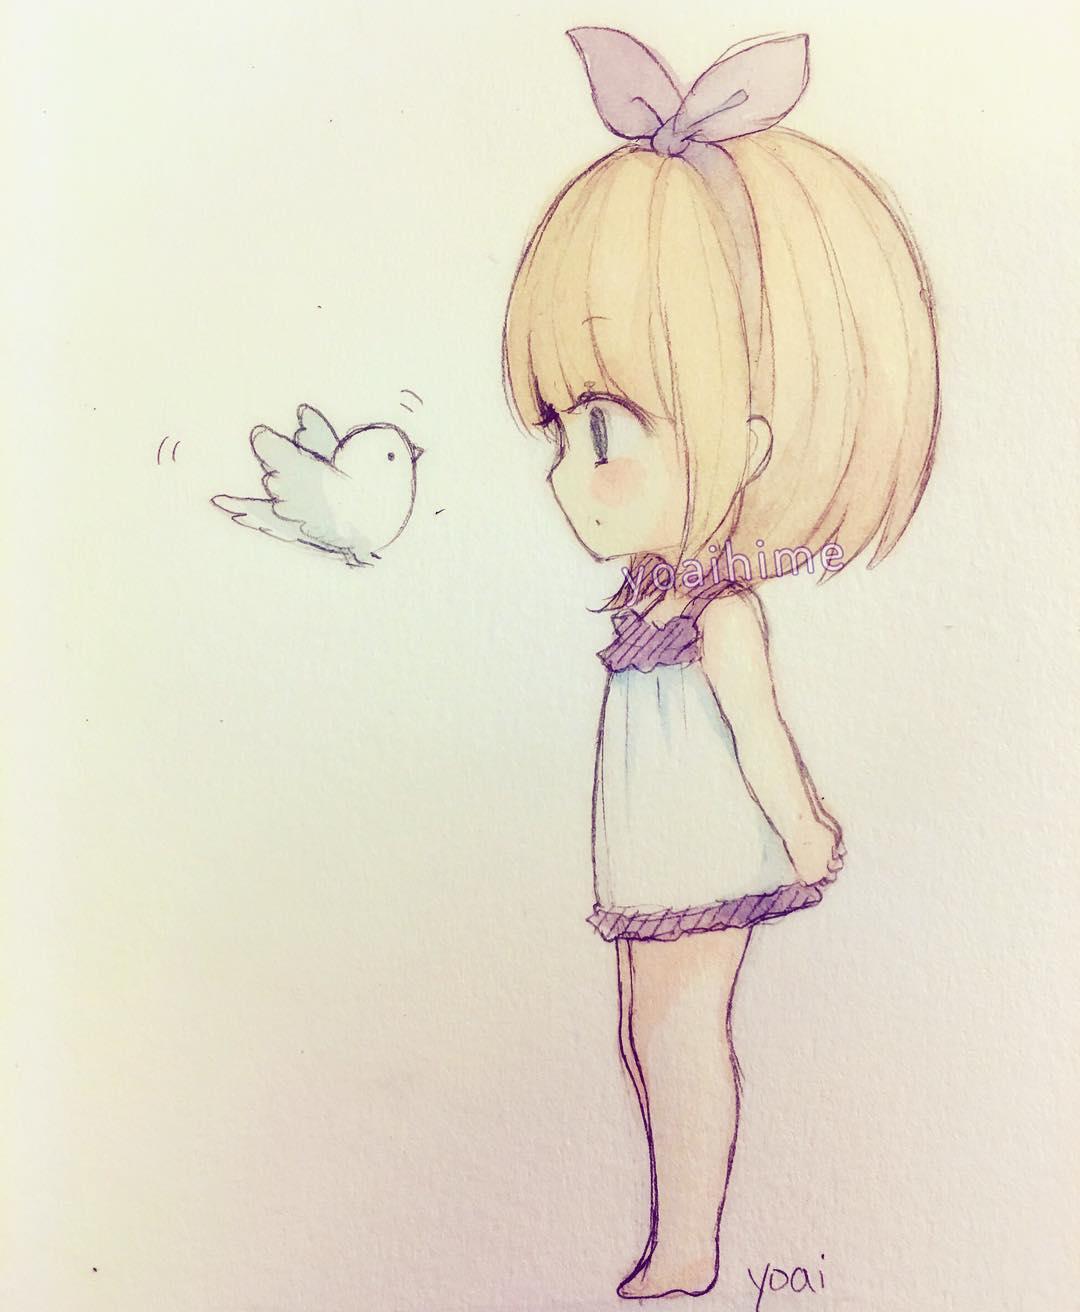 1080x1312 Easy Cute Anime Drawings I Draw A Cute Anime Girl